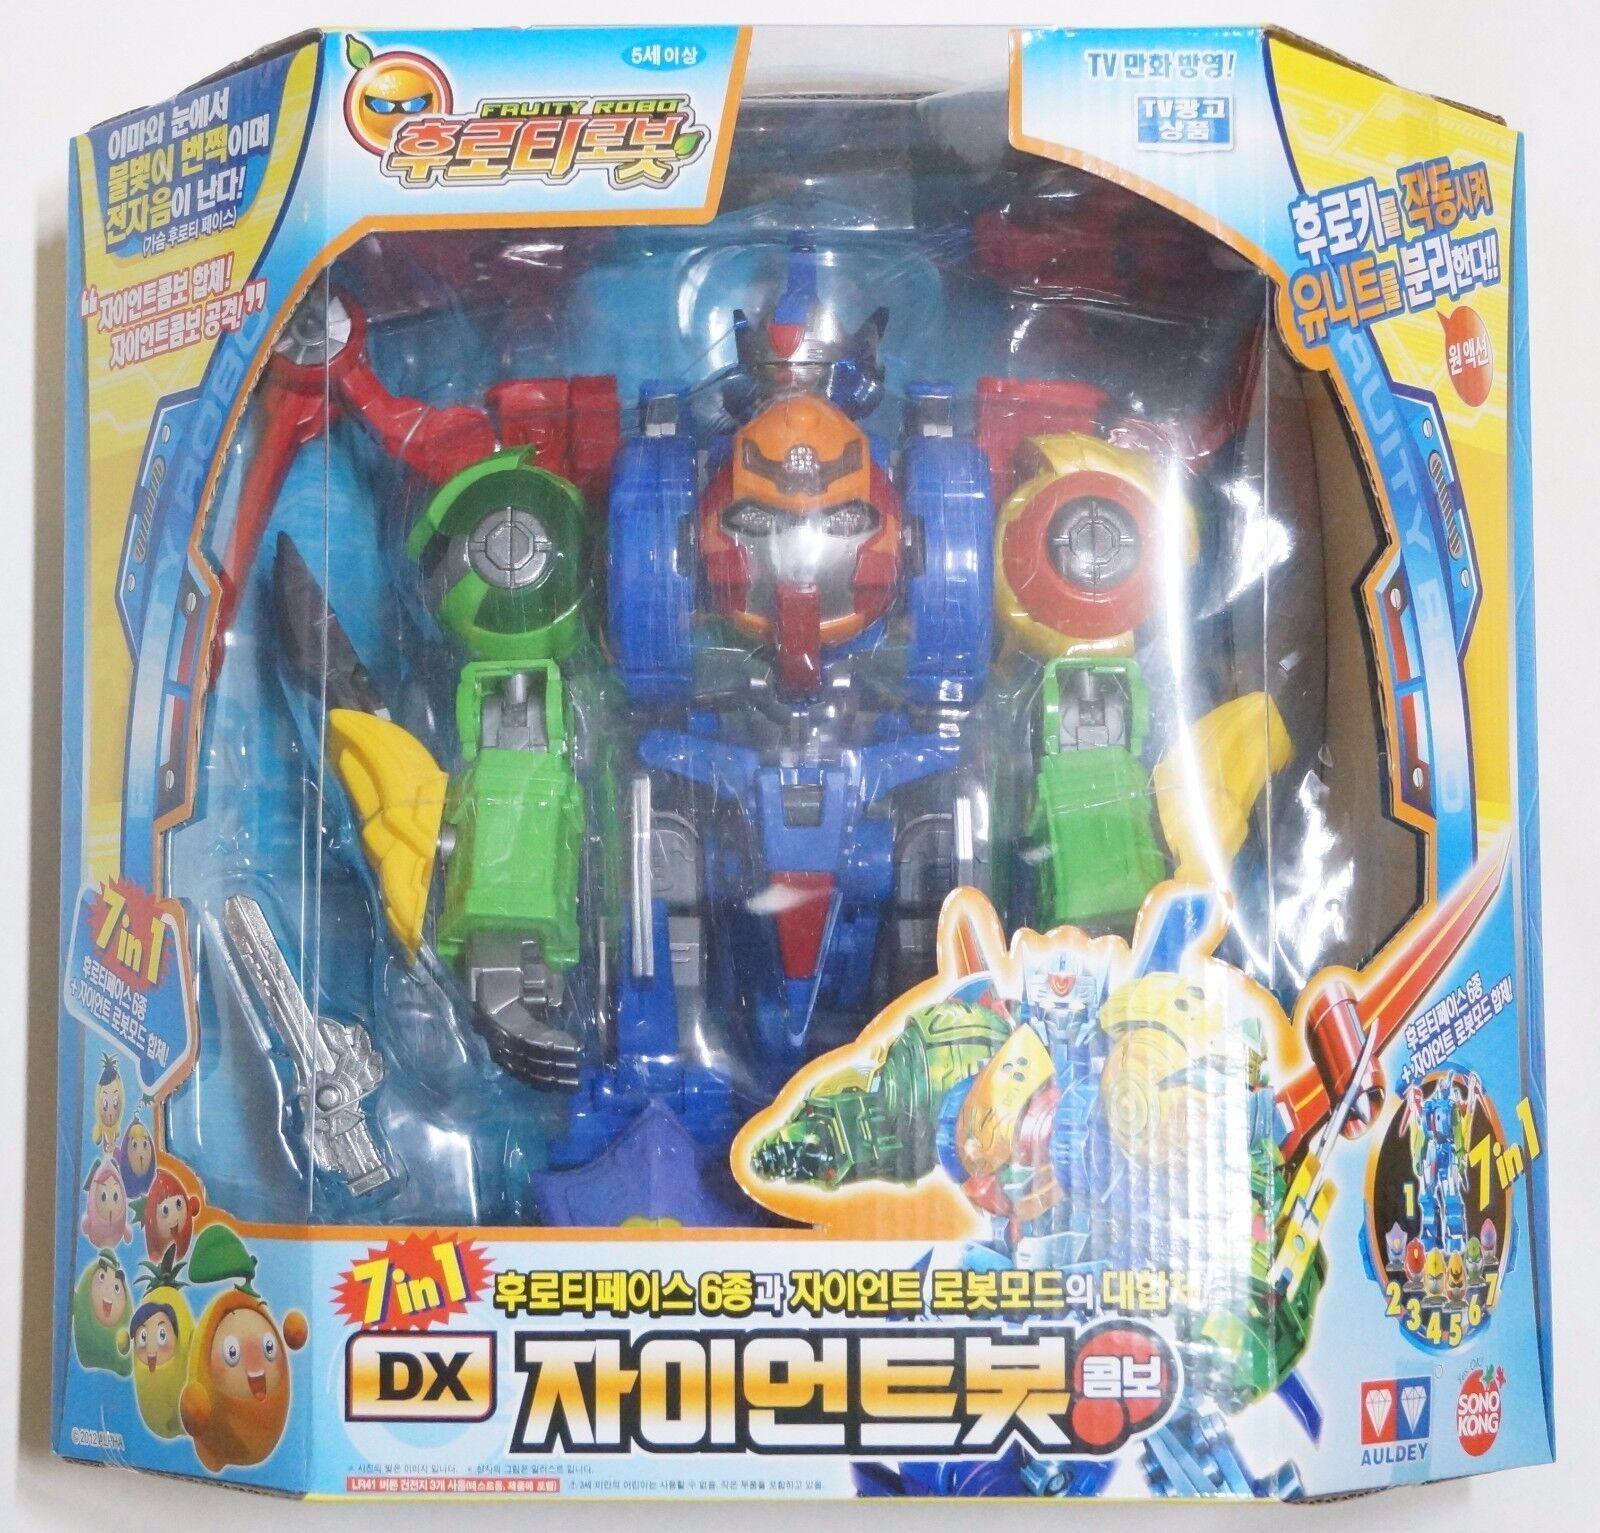 Auldey sonokong fruchtig robo  dx - roboter - 7 in 1 licht & sound wert